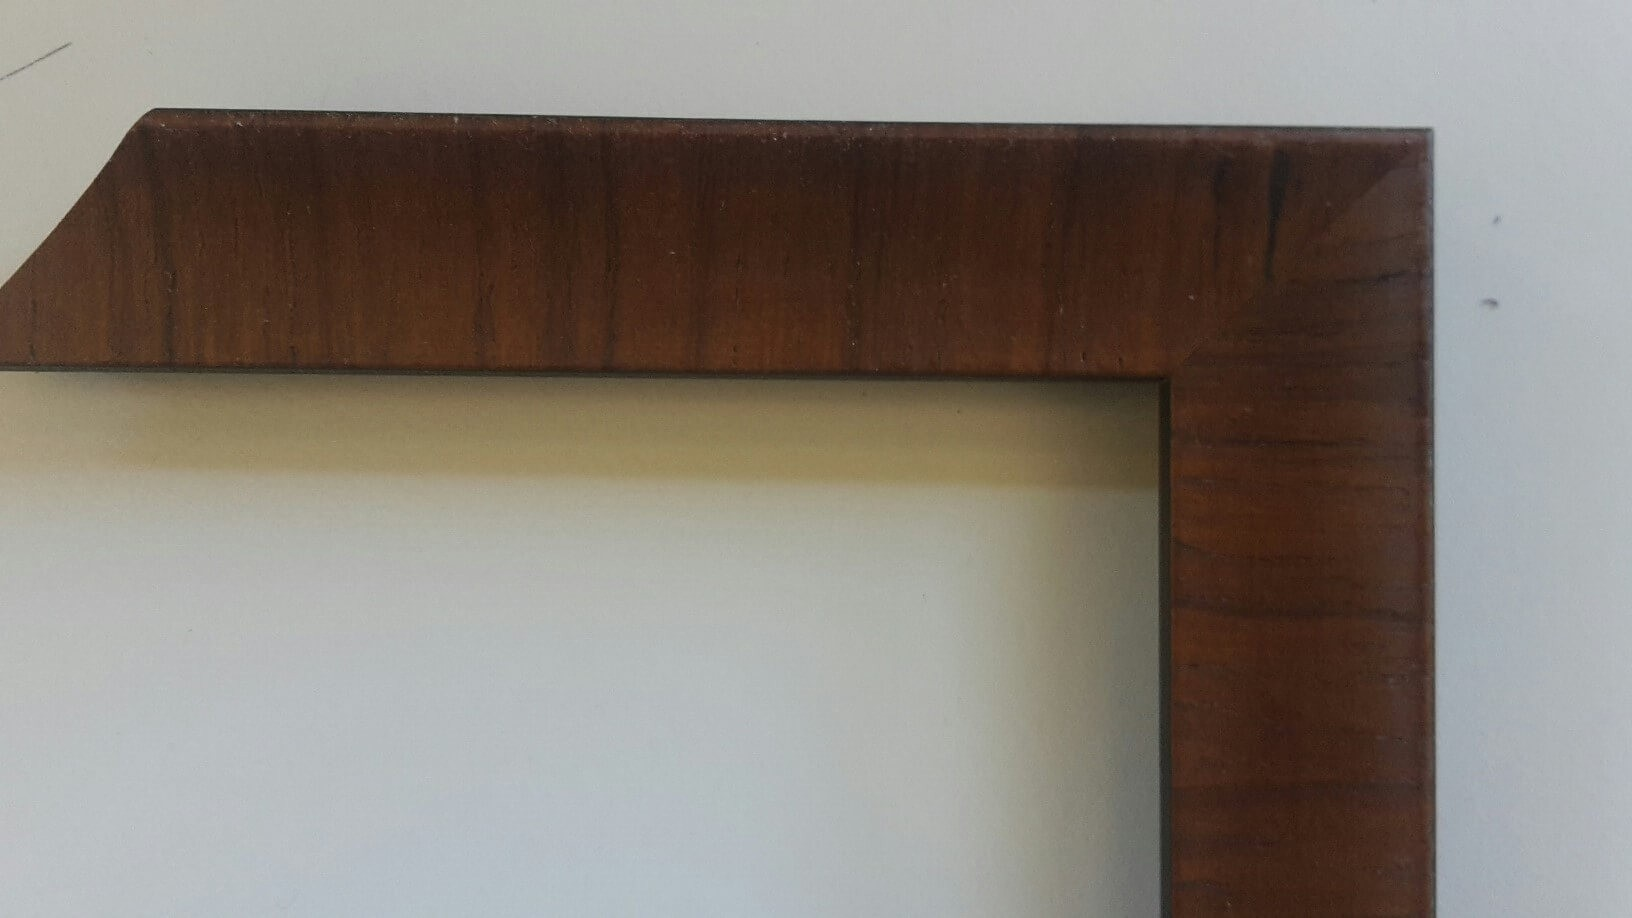 Fabira Tuco Wurzelfurnier Rotbraun, Rücken Schwarz ca. 30mm × 23mm